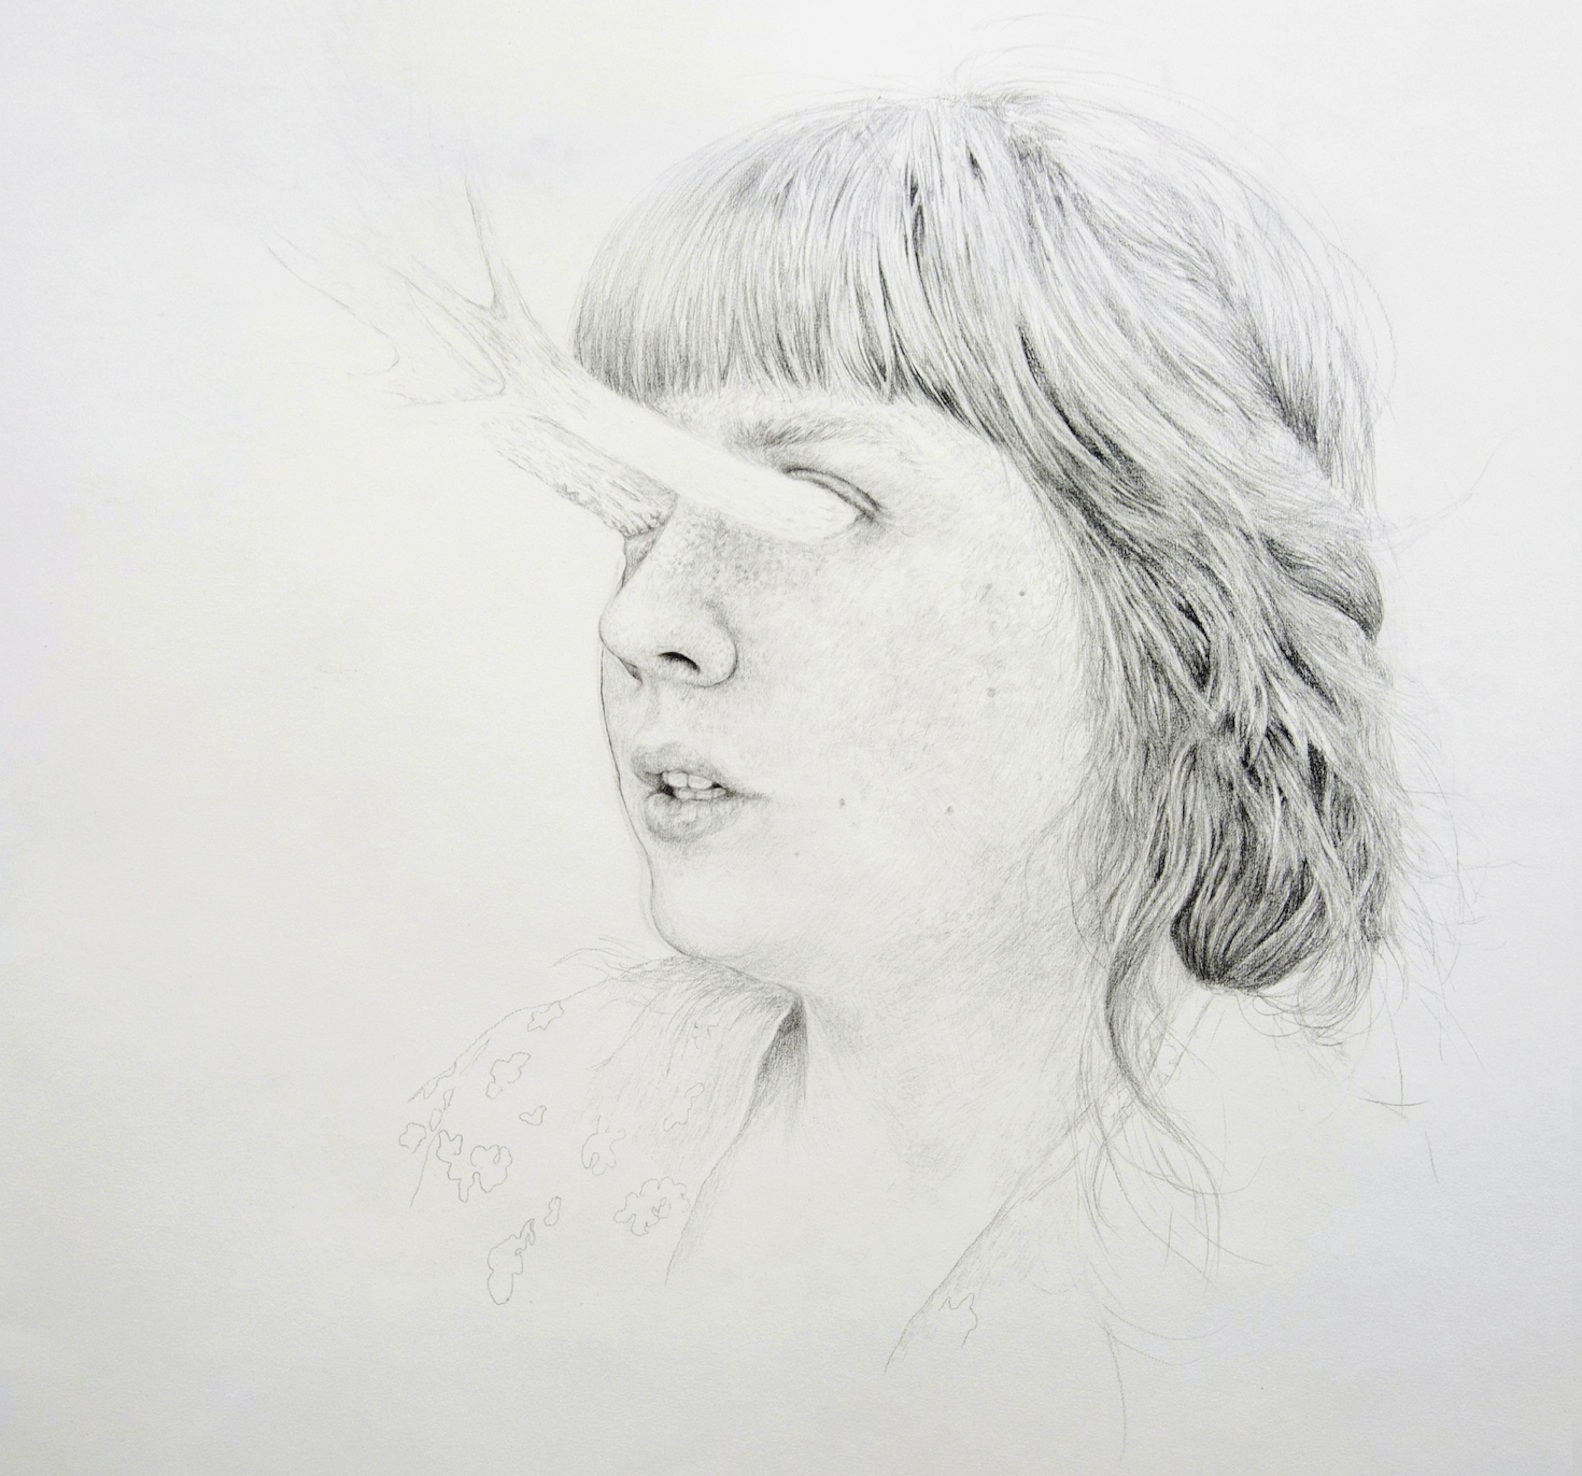 Iris, graphite on paper, 140 x 160 cm, 2012